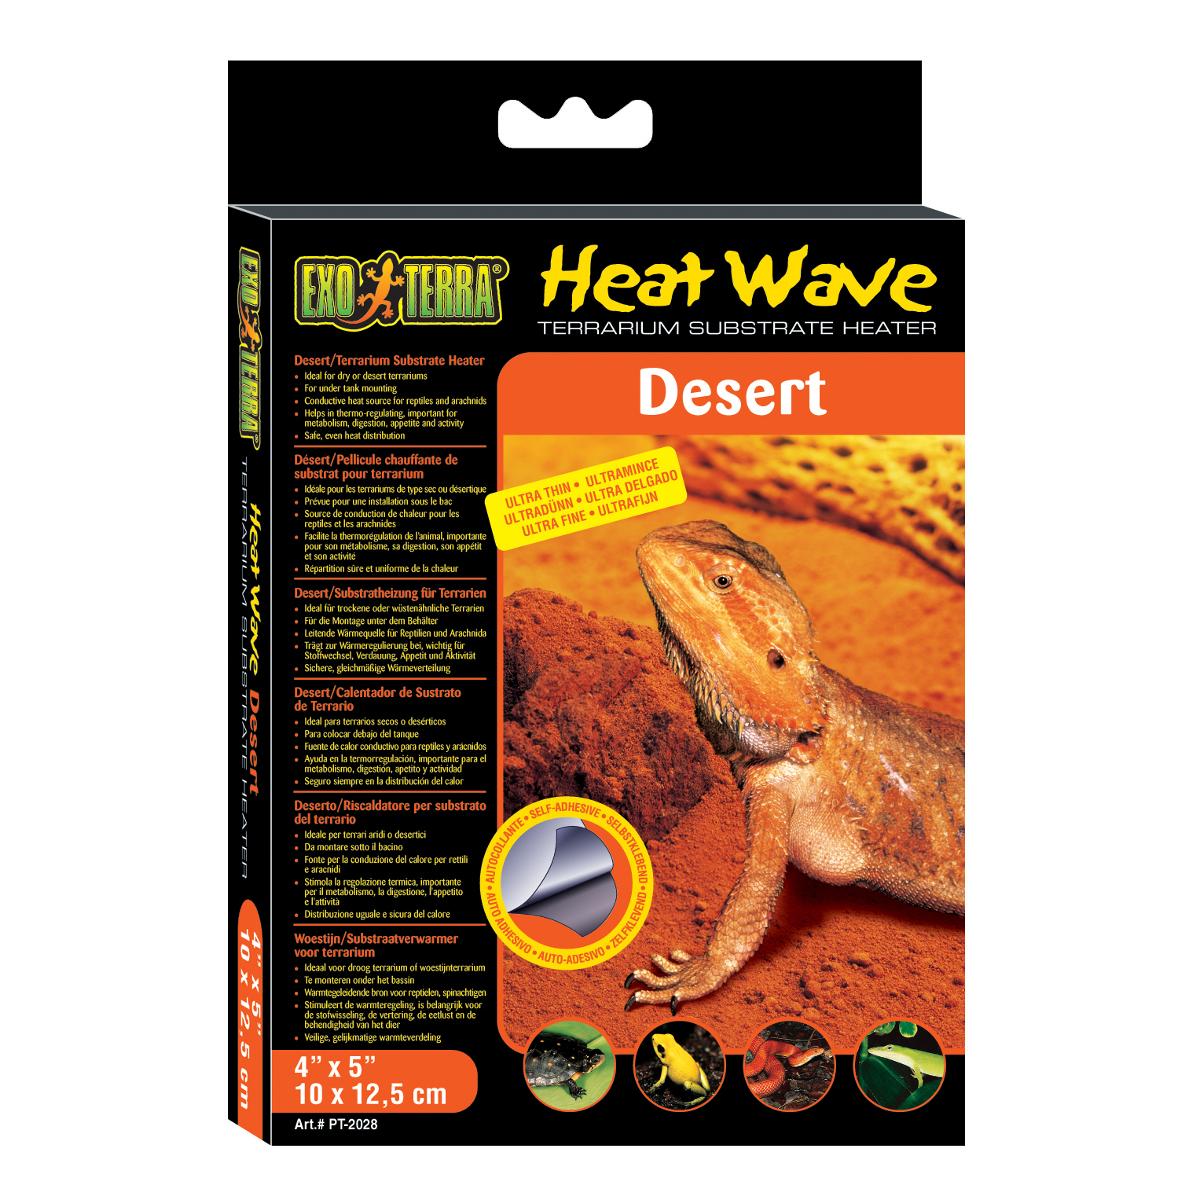 Deska topná EXO TERRA Heat Wave Desert nejmenší 4 W